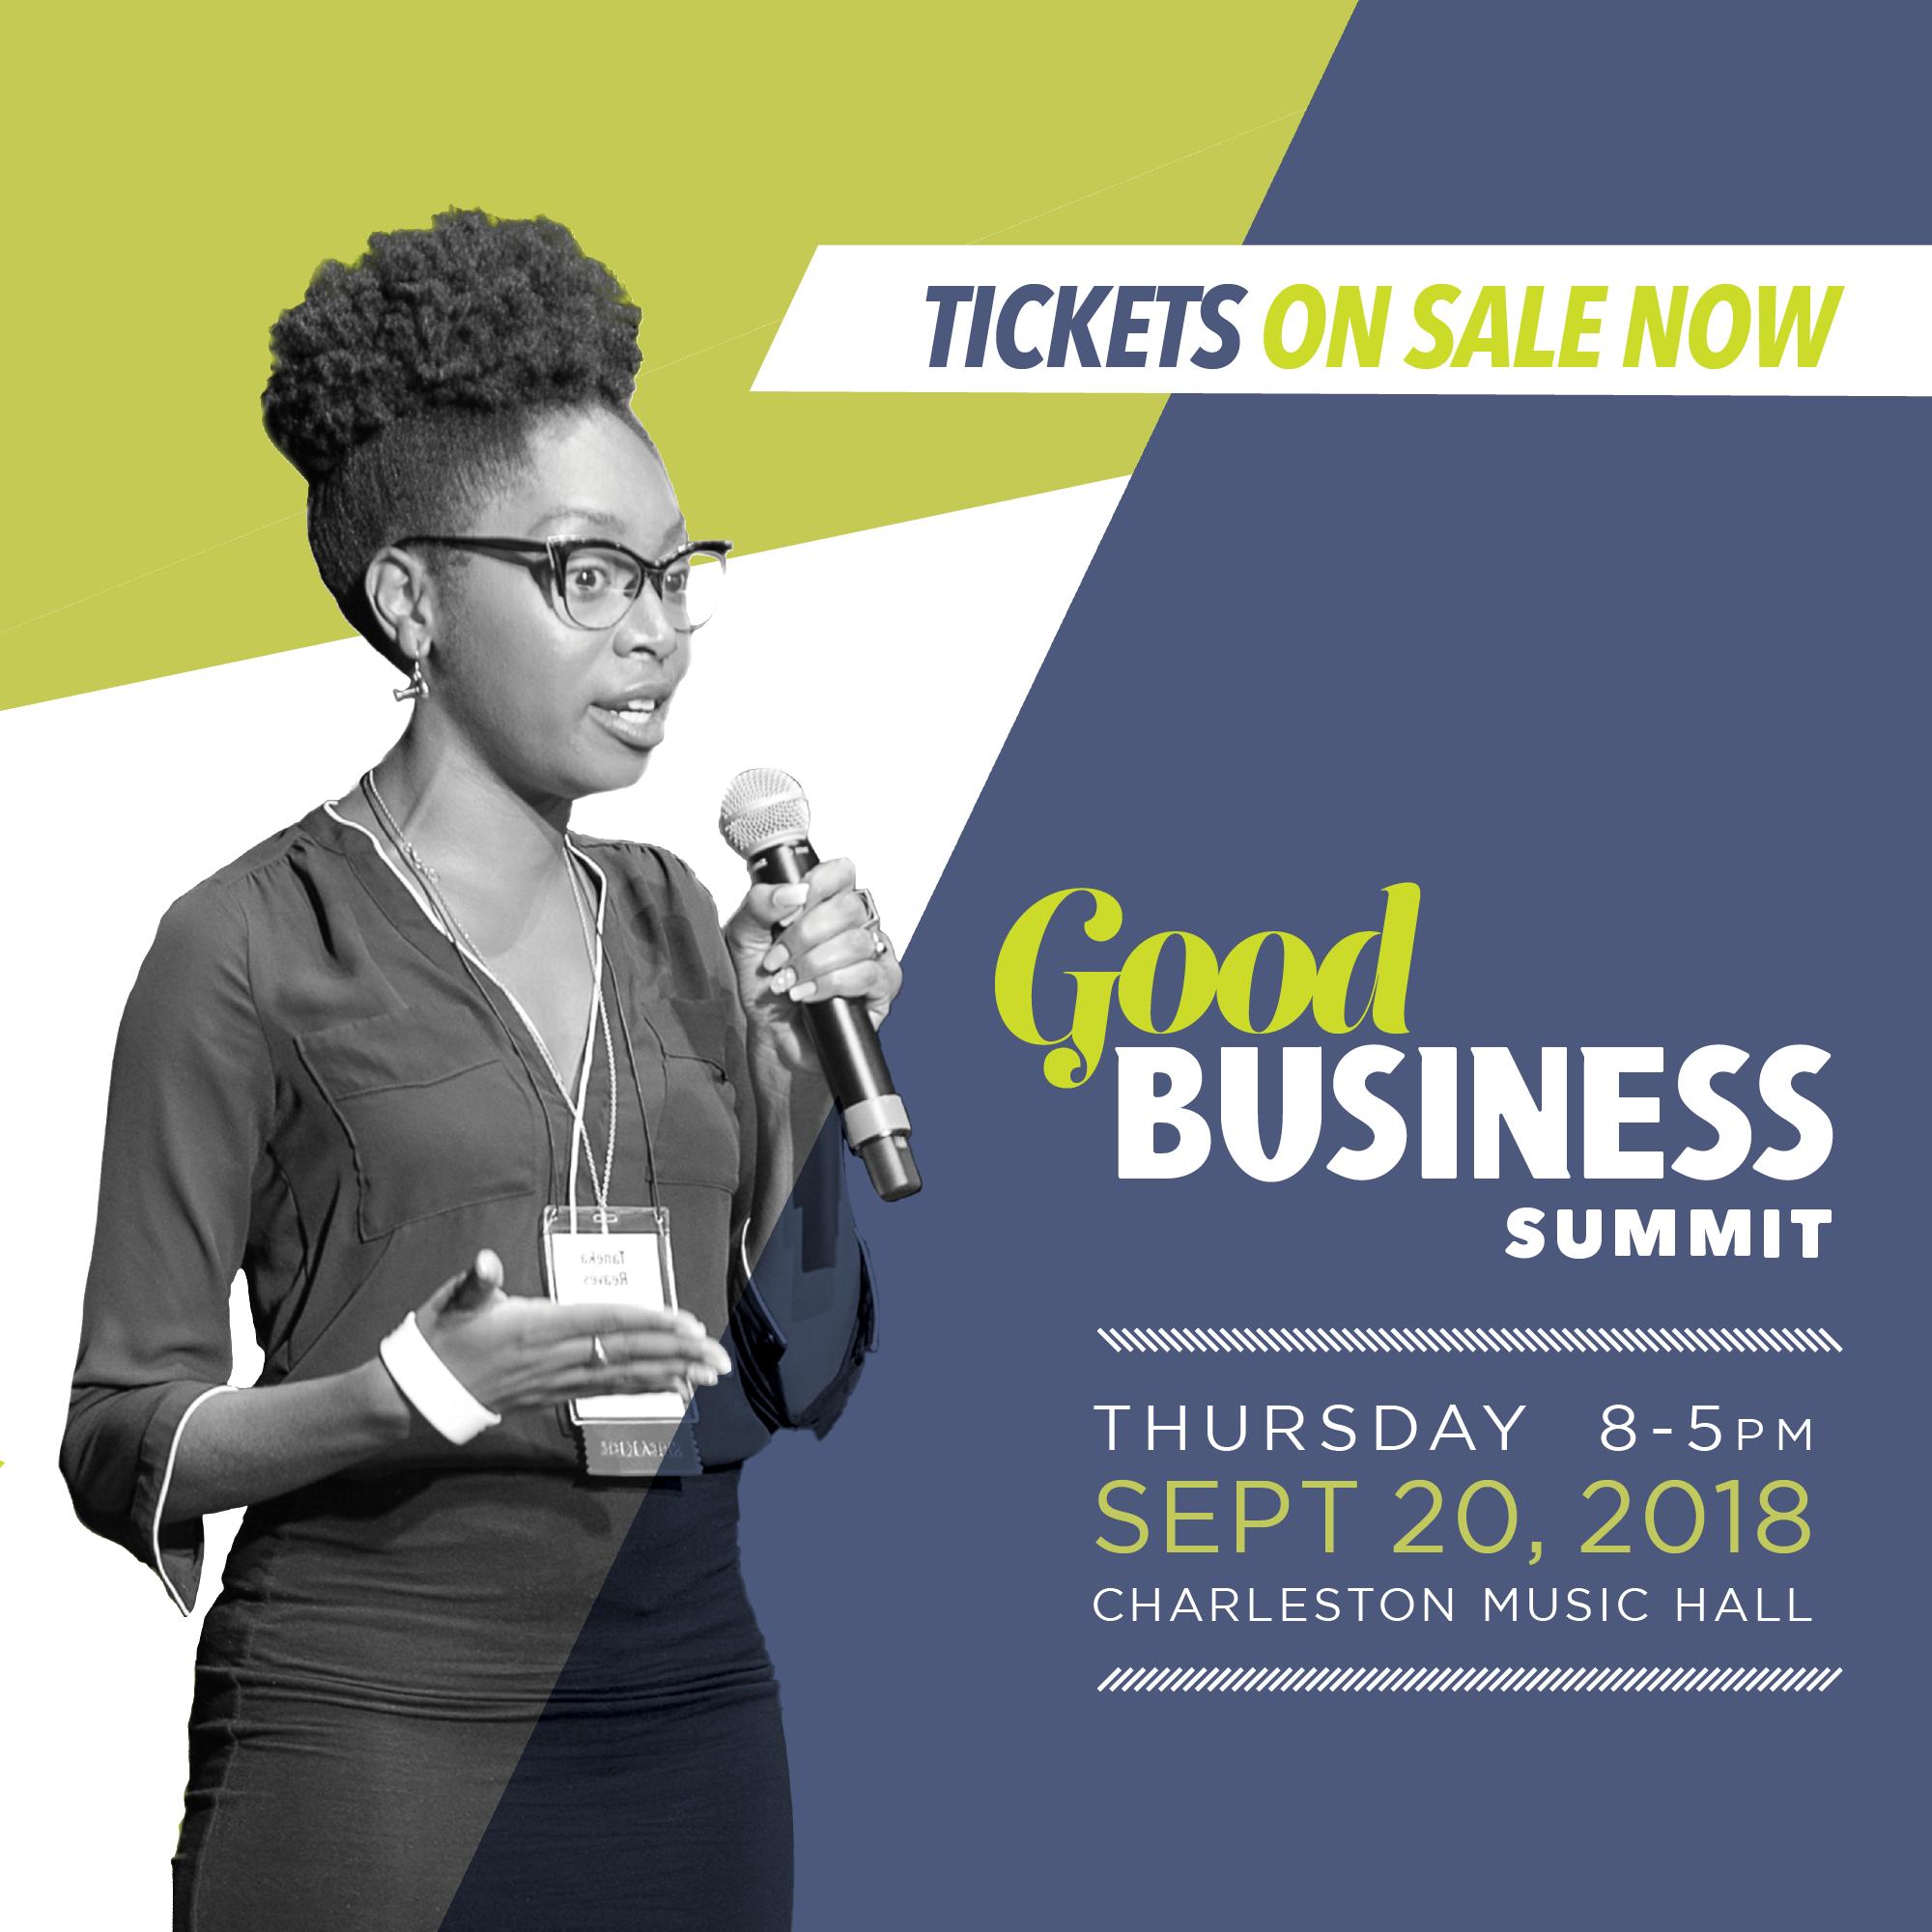 Good Business Summit